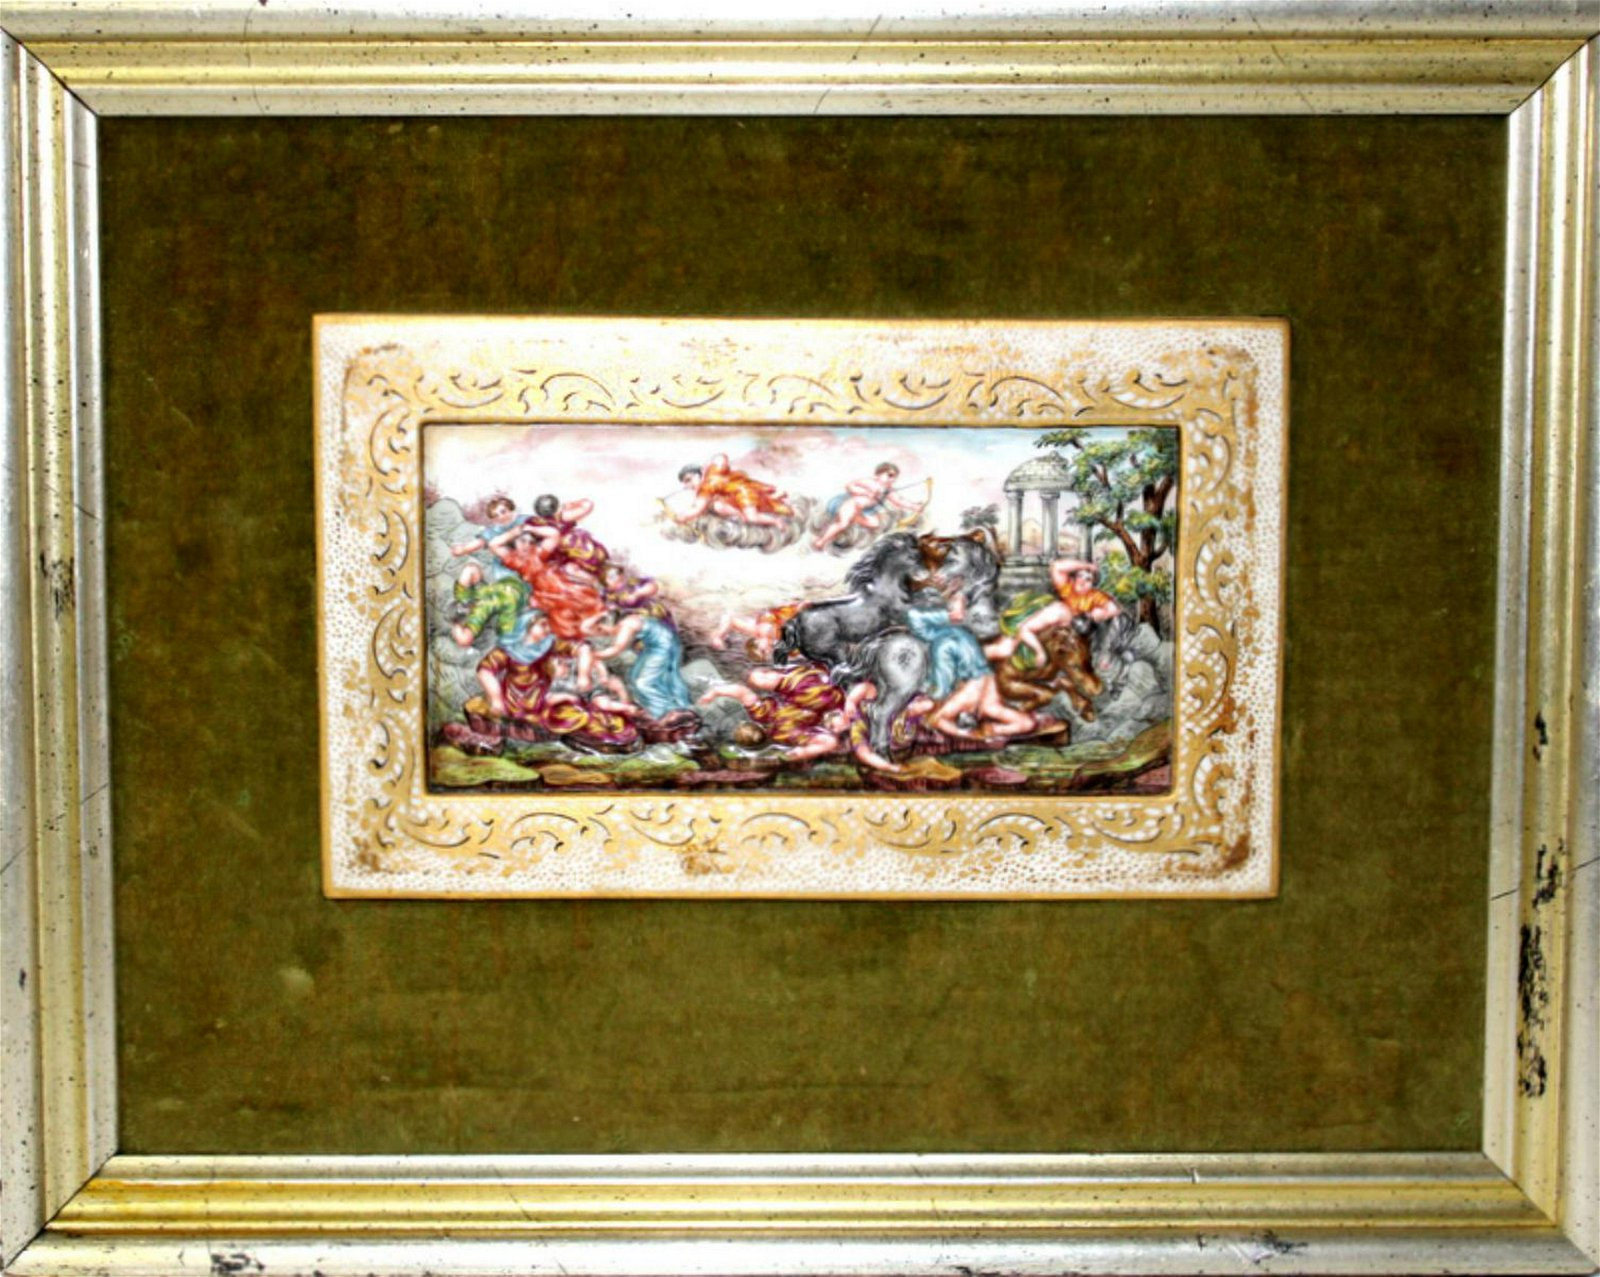 Antique Capodimonte Porcelain Plaque